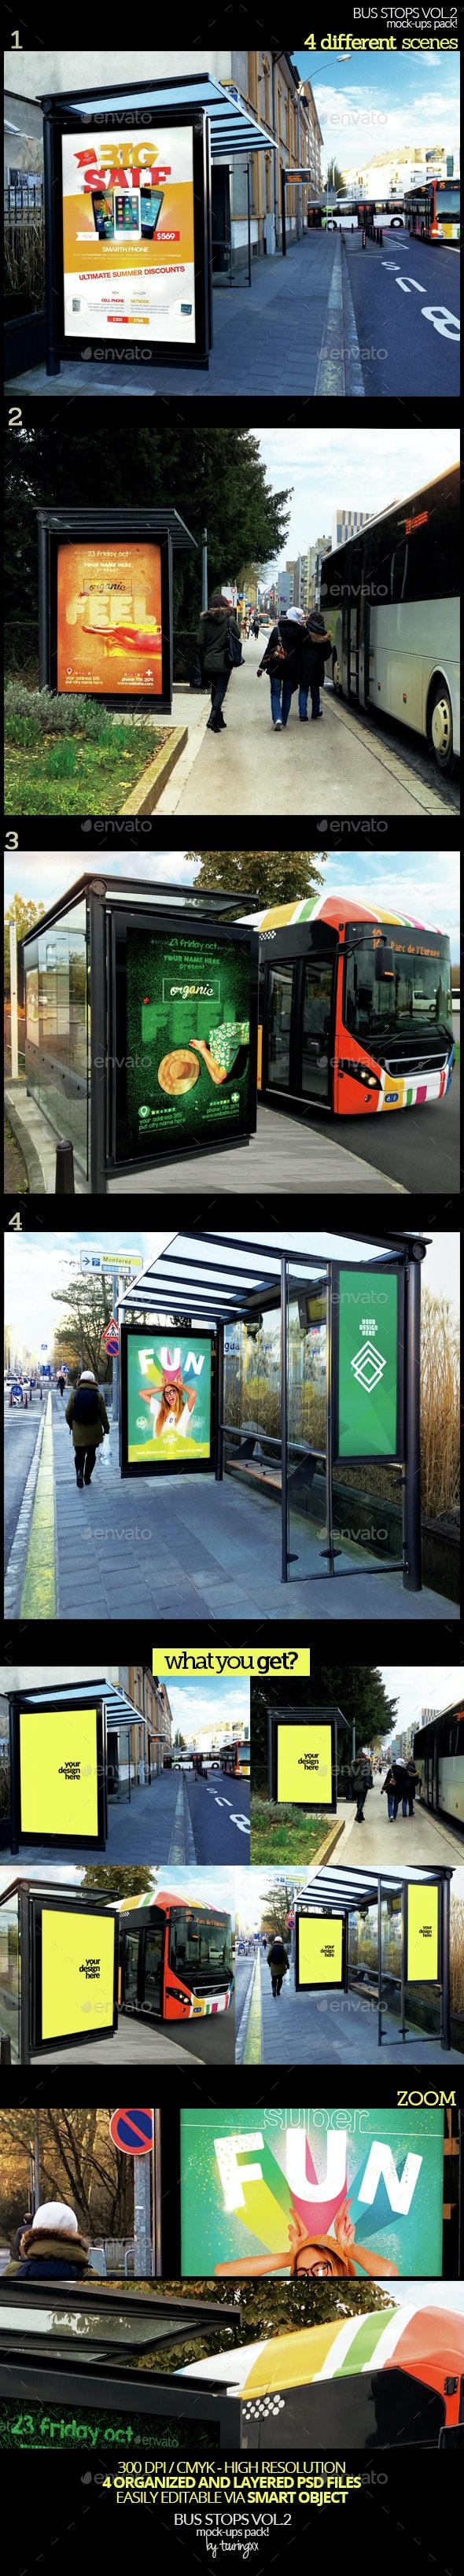 Bus Stops Vol.2 Mock-Ups Pack - Product Mock-Ups Graphics